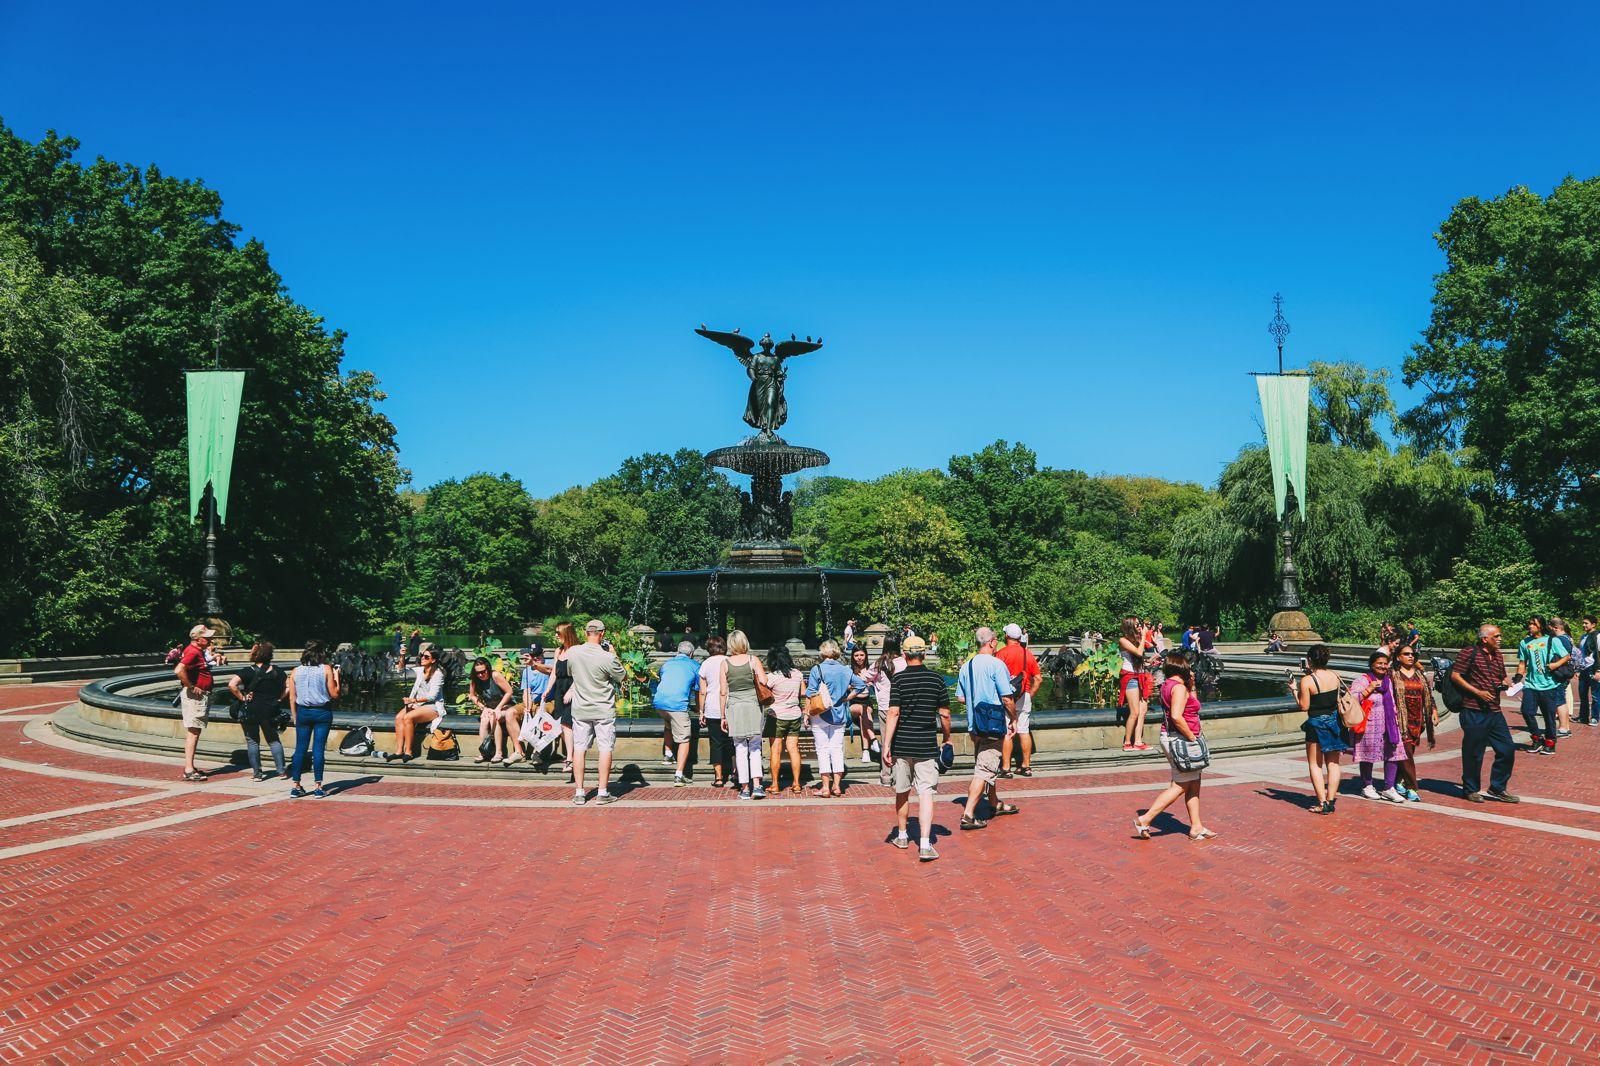 Central Park - A New York Photo Diary (10)